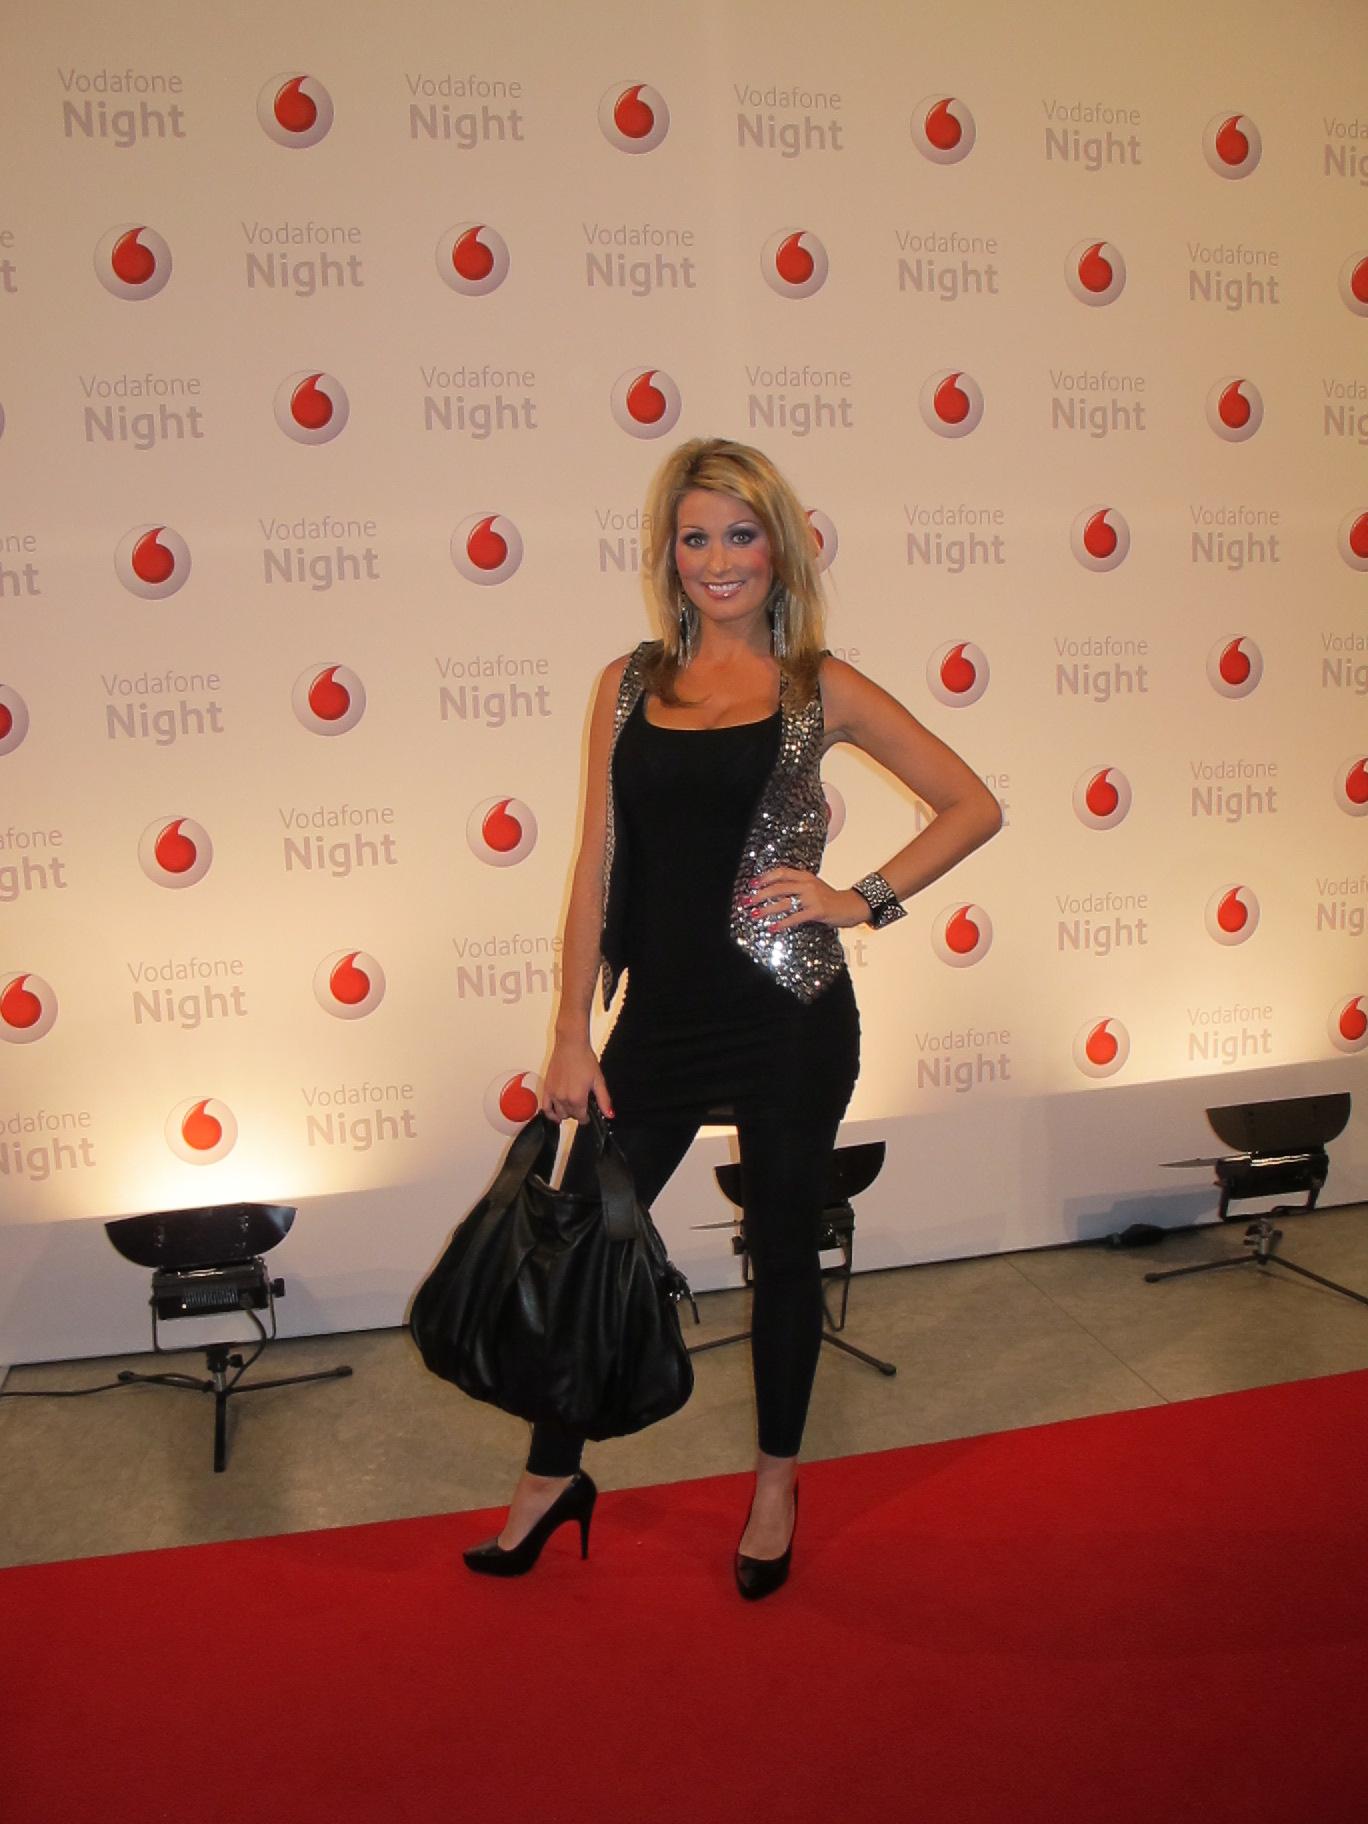 Vodafone Night 2010